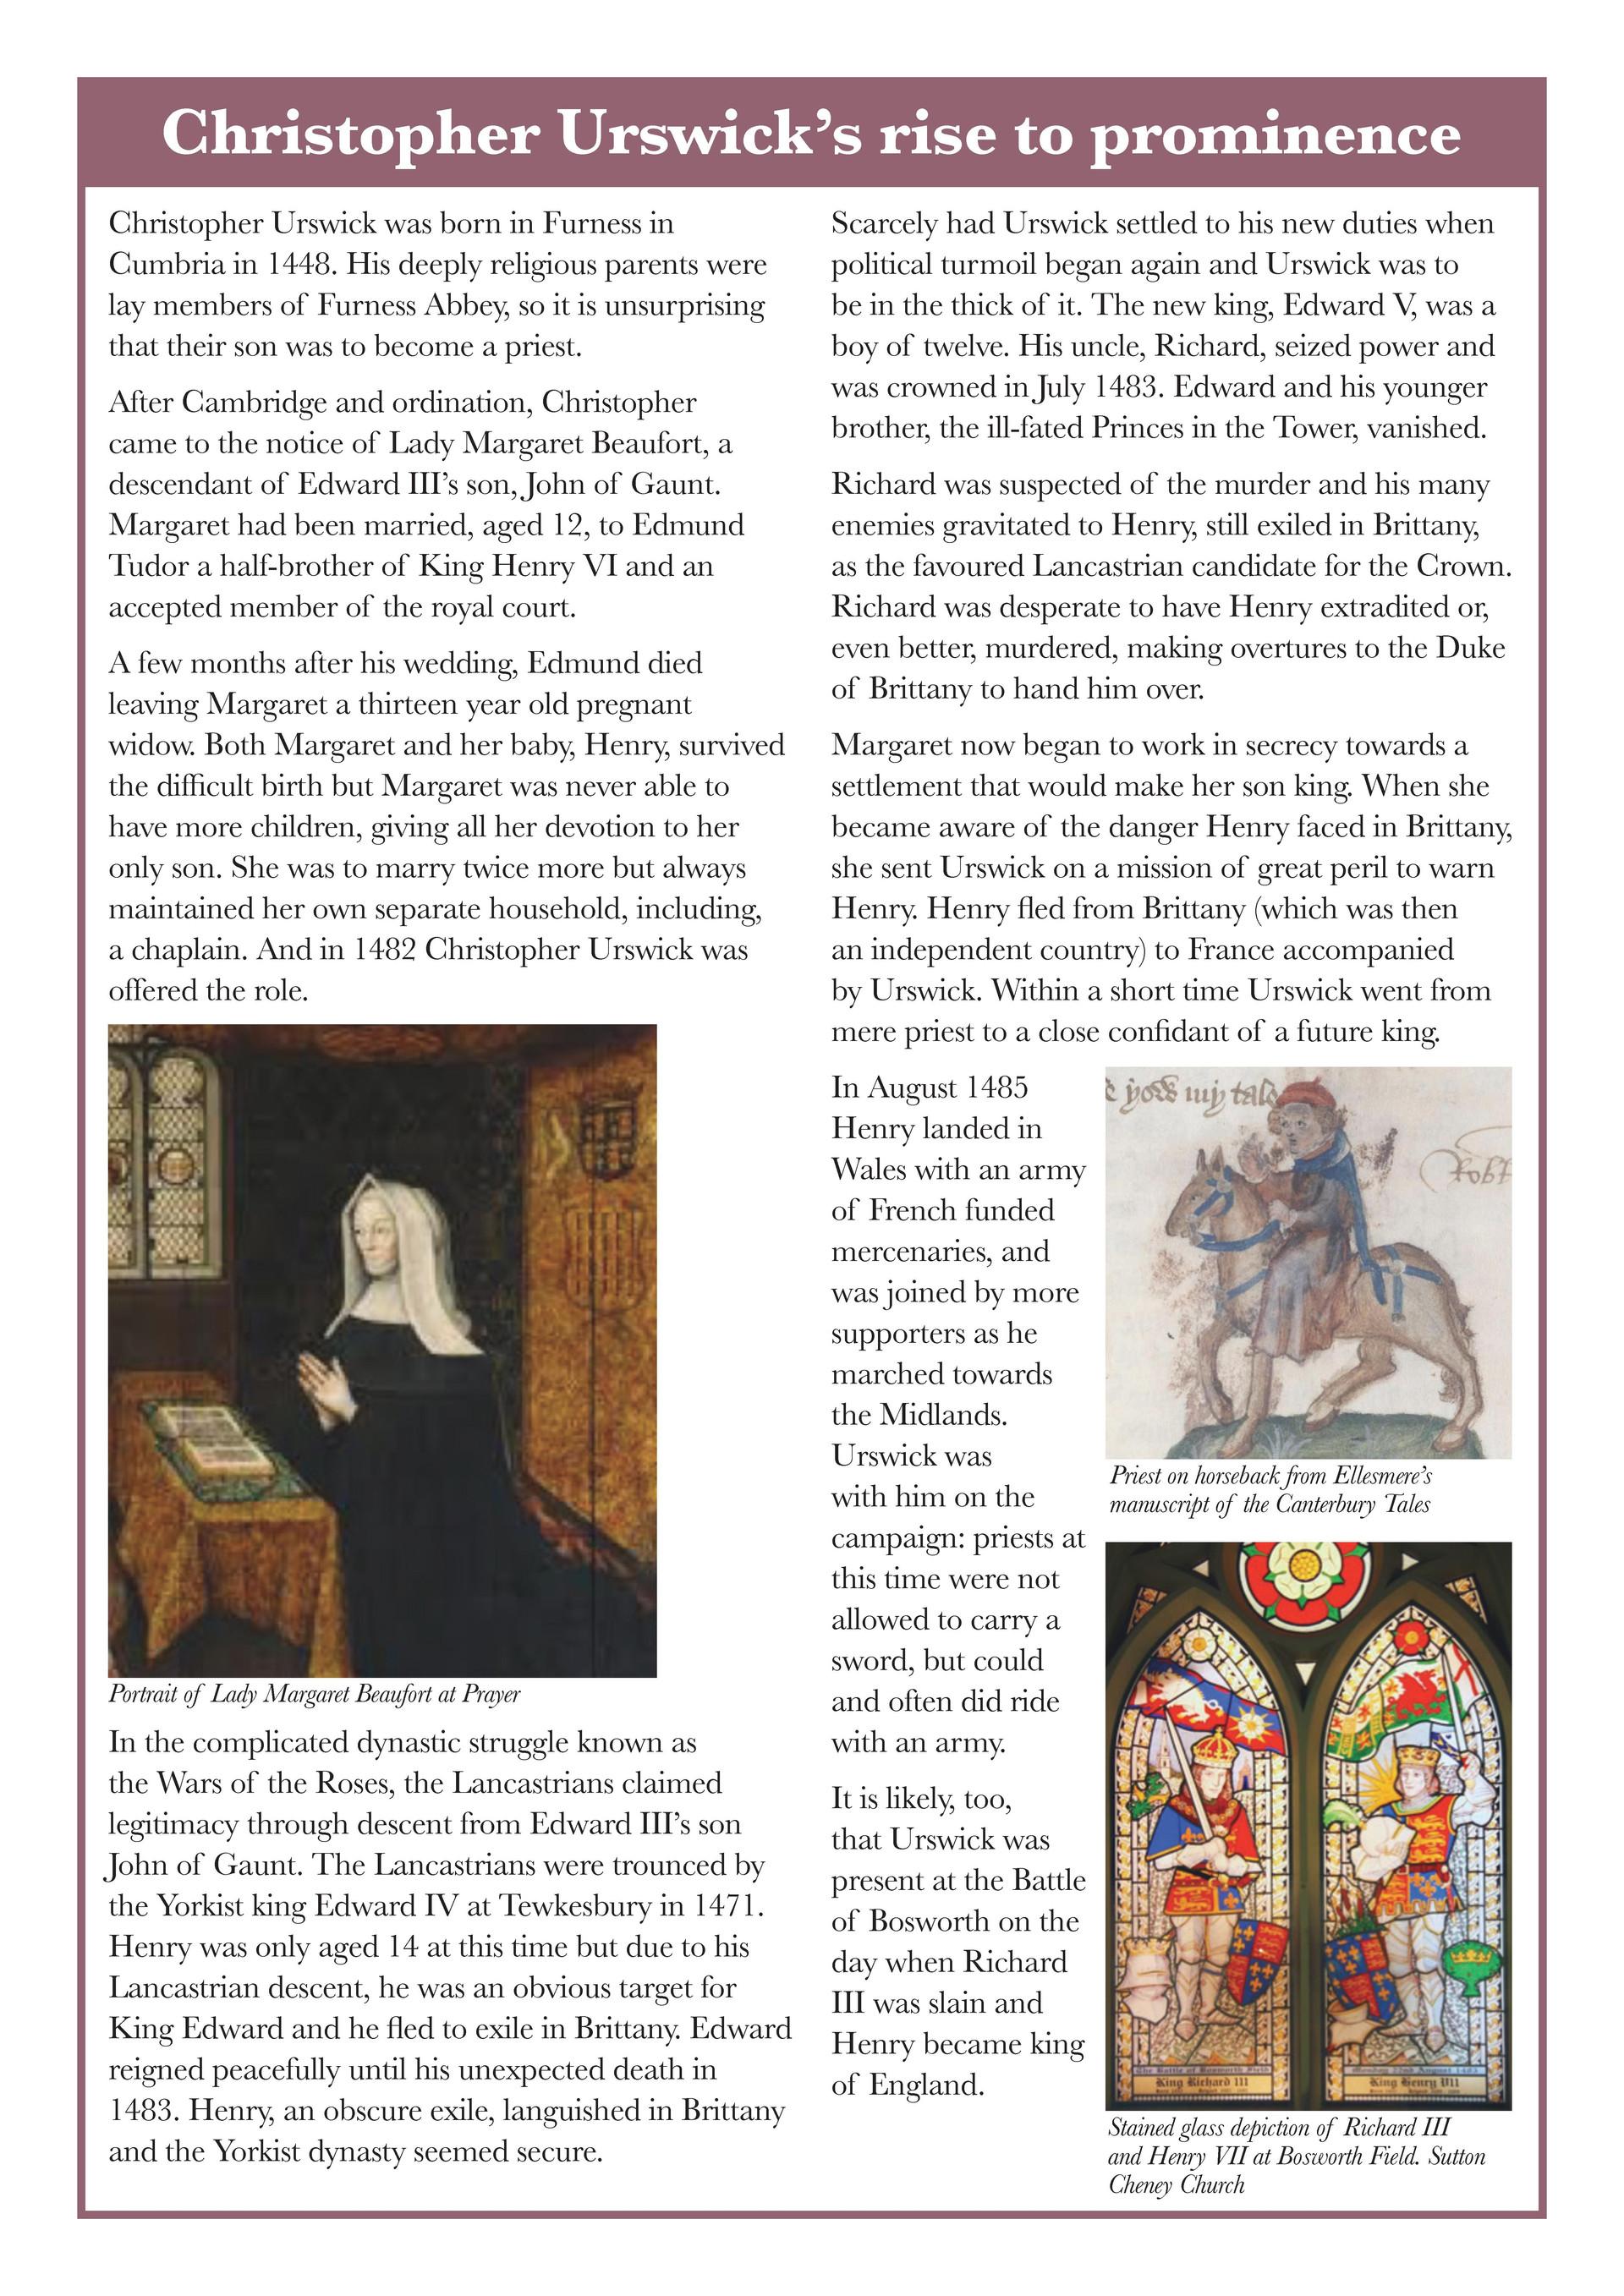 CHRISTOPHER URSWICK'S RESTORATION OF ST. AUGUSTINE'S CHURCH /2